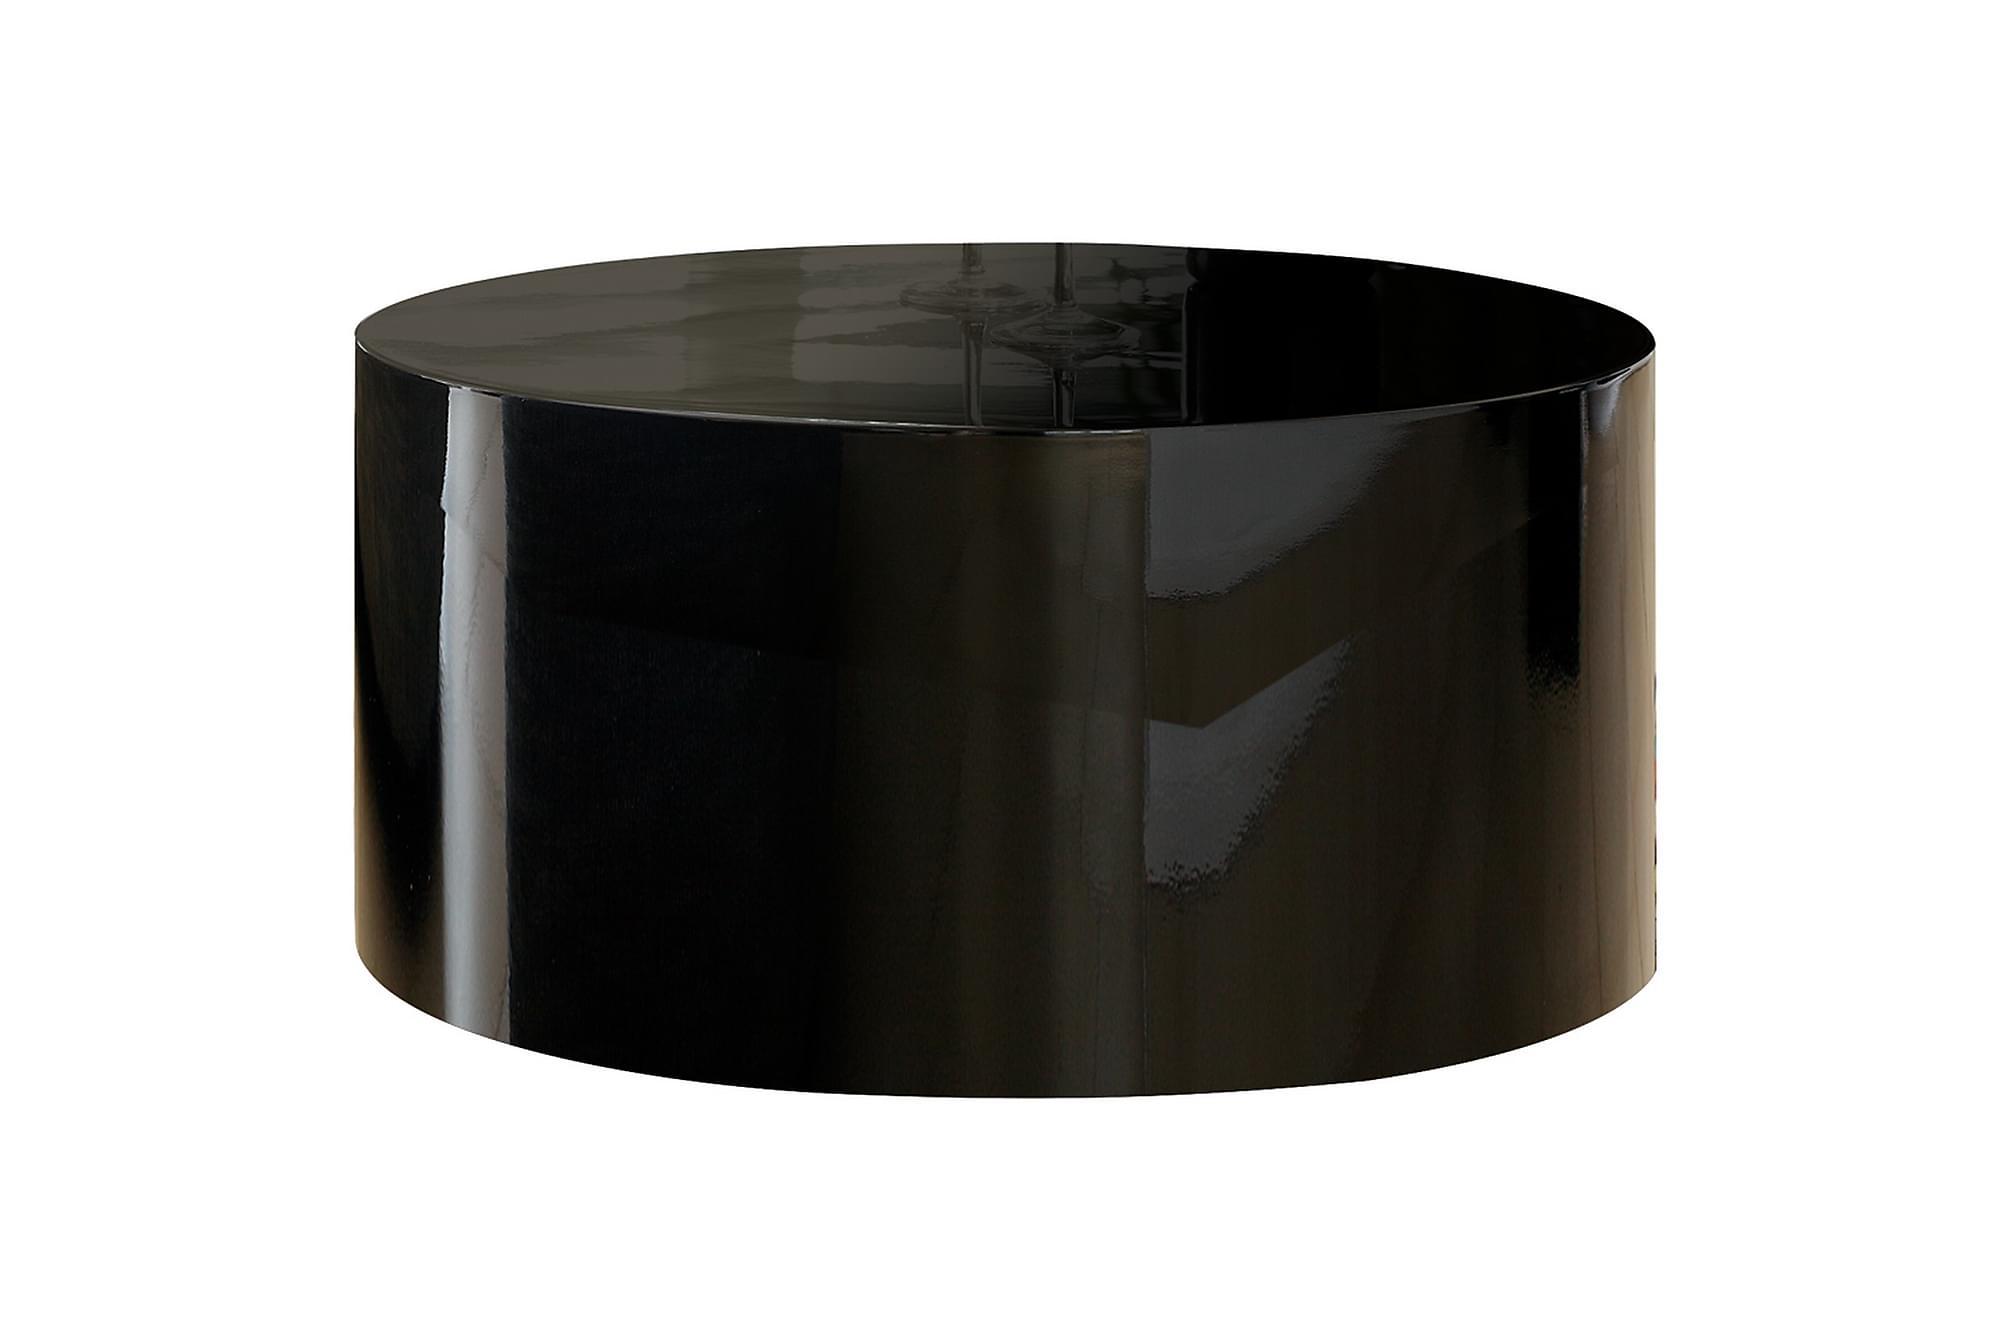 Soffbord of 60 cm round black